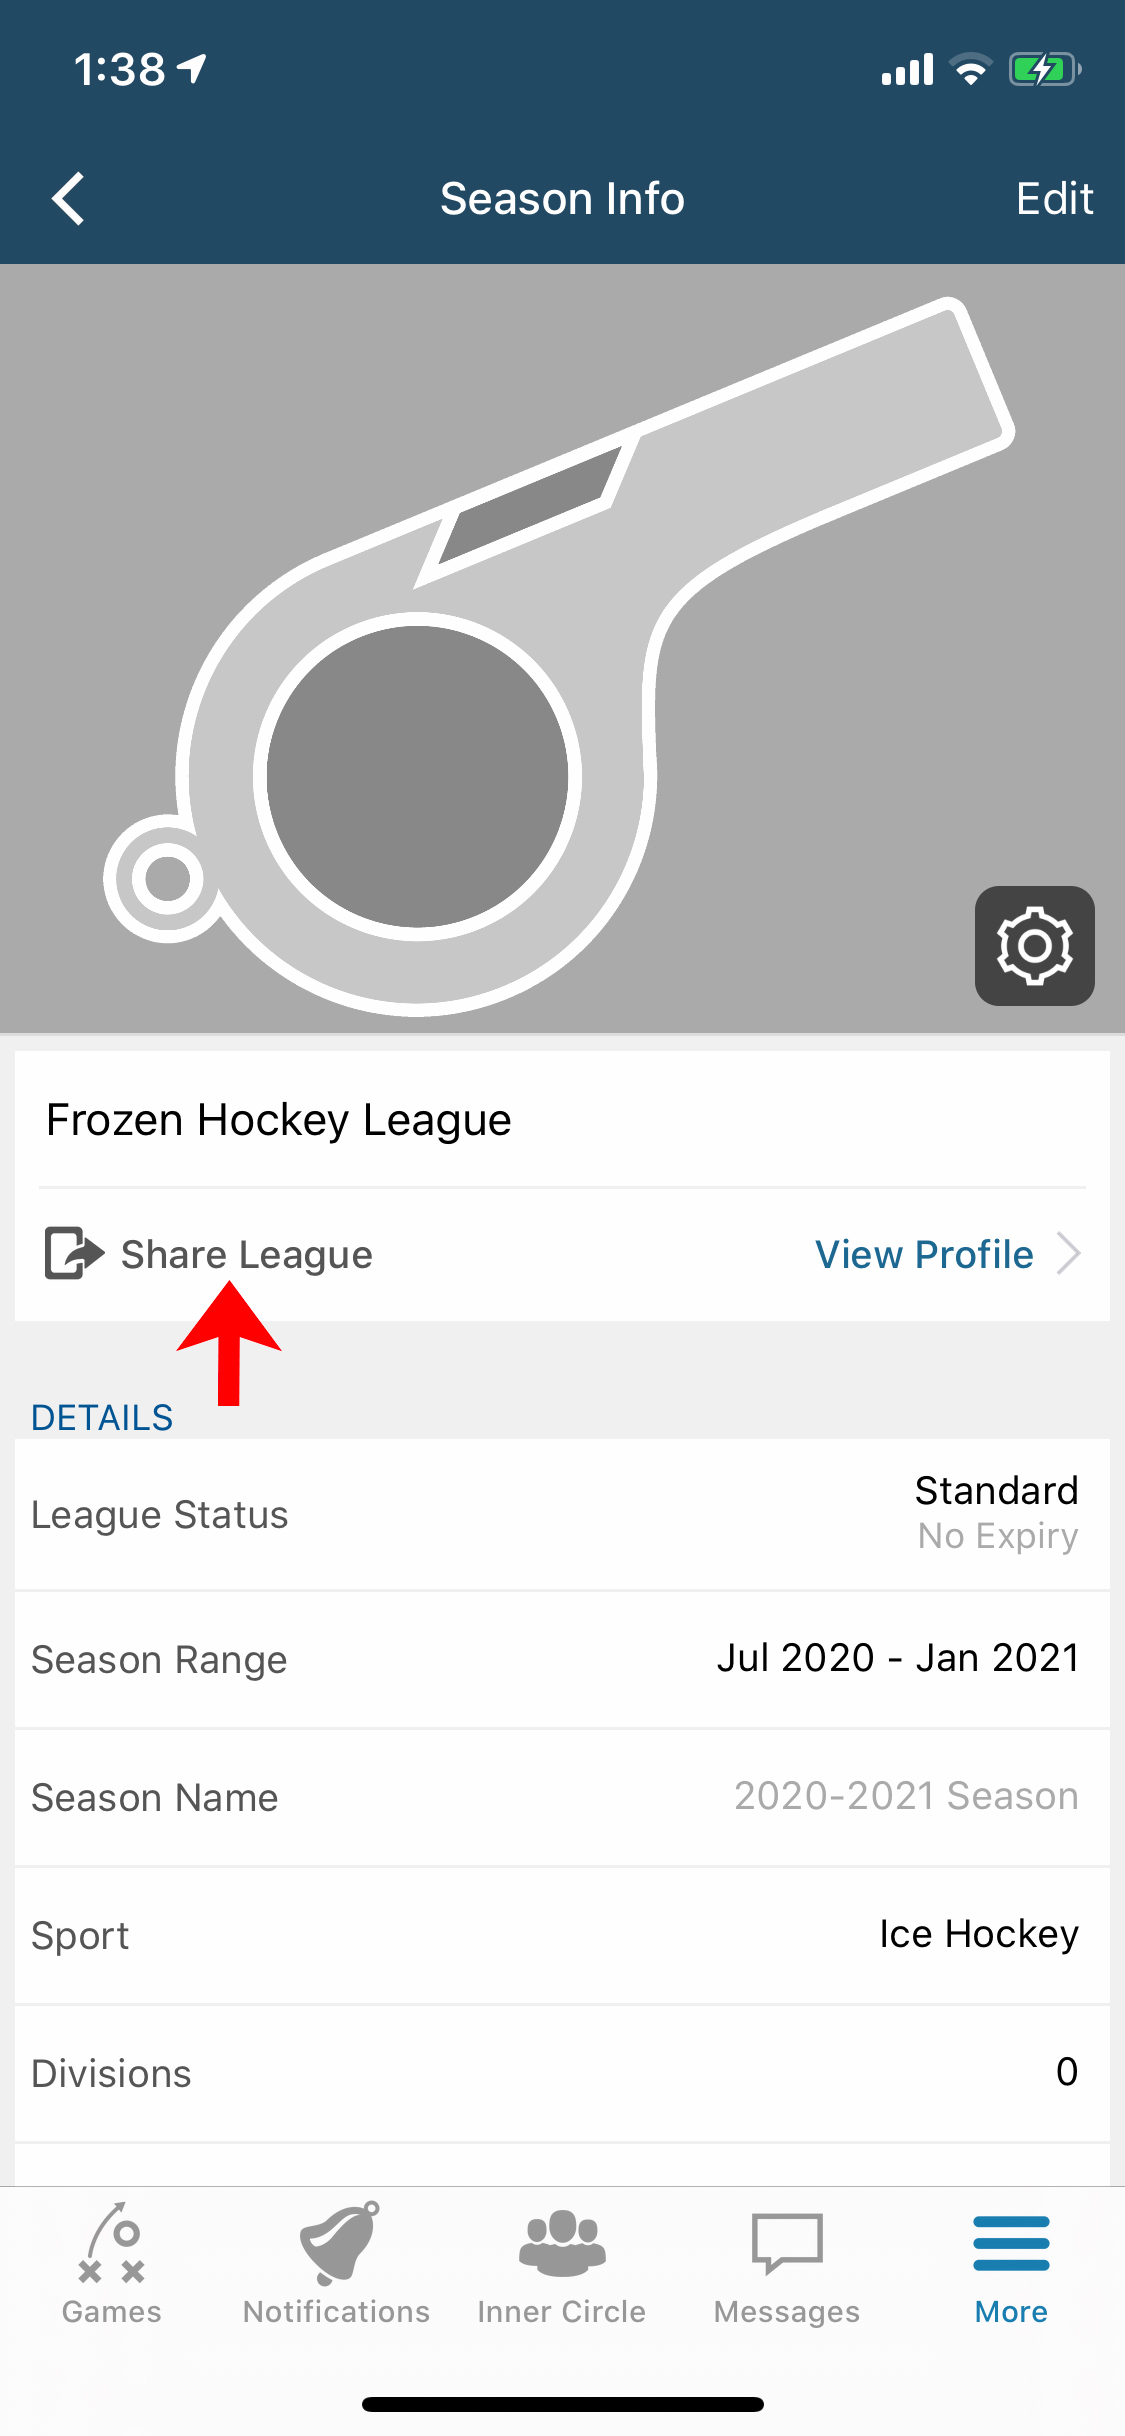 league-profile-share-button